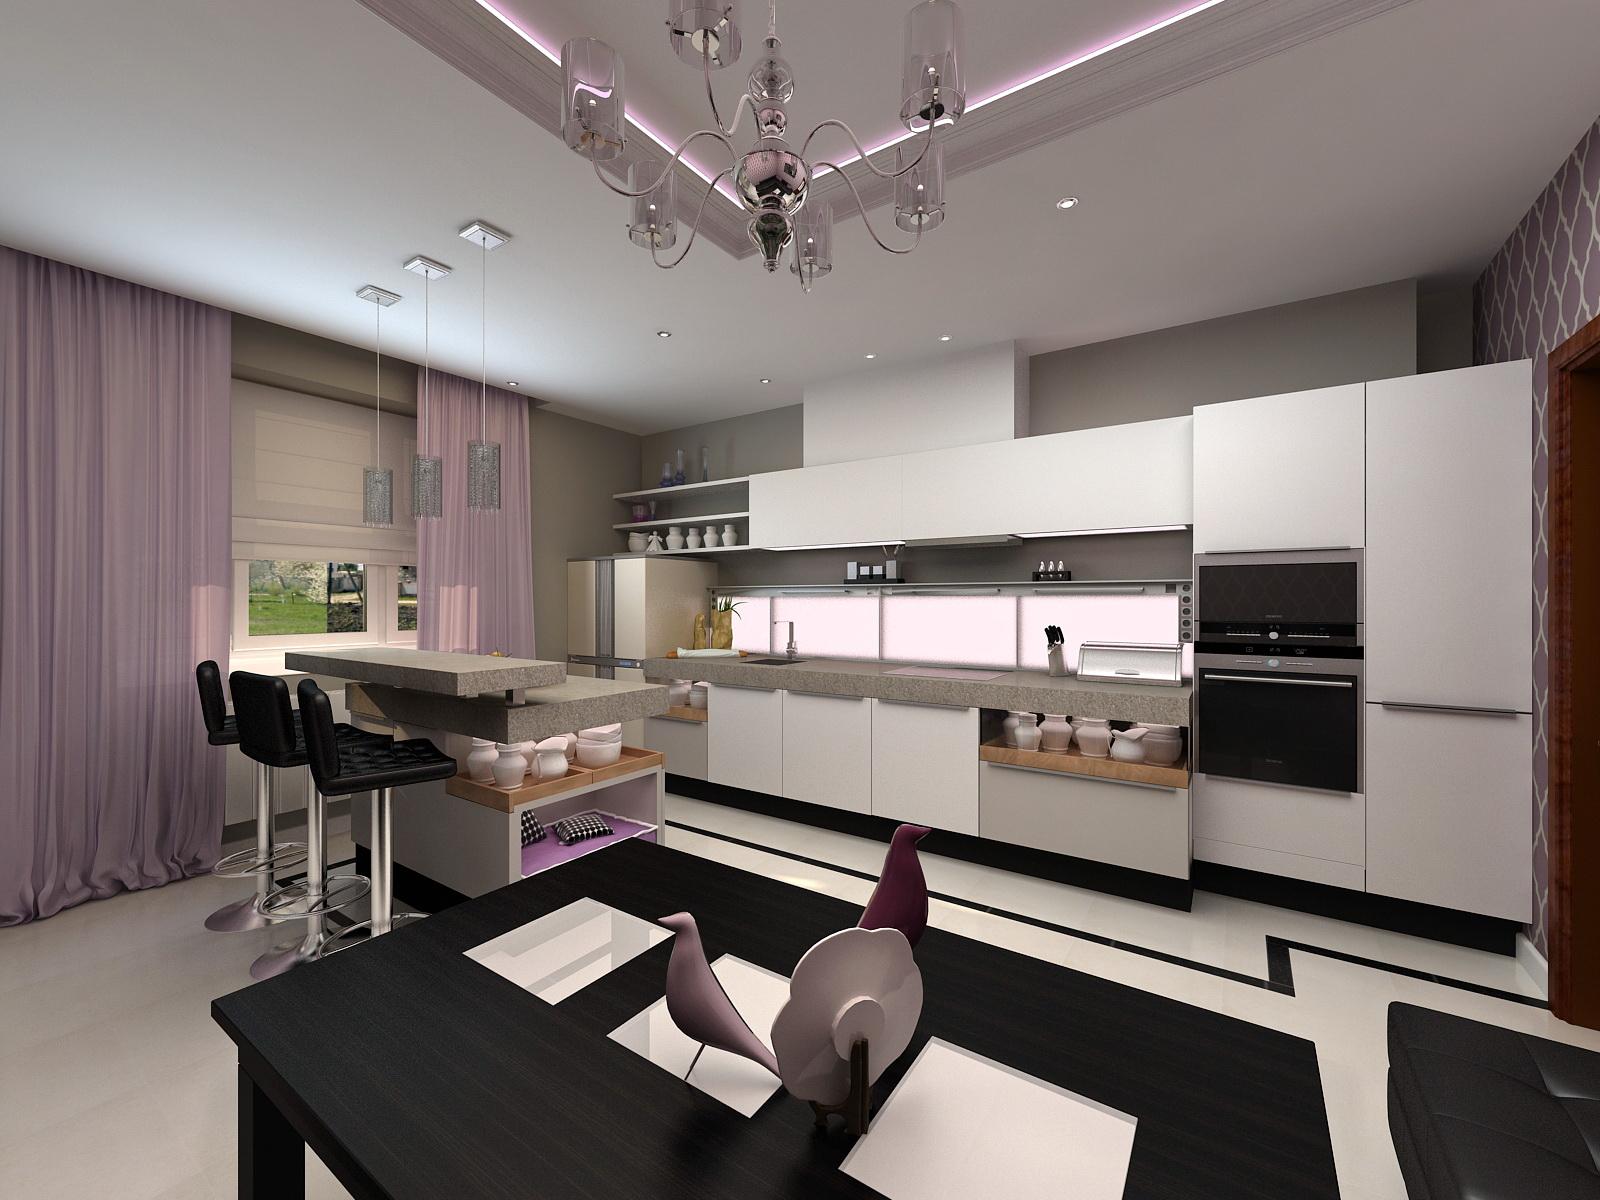 фото кухни студии